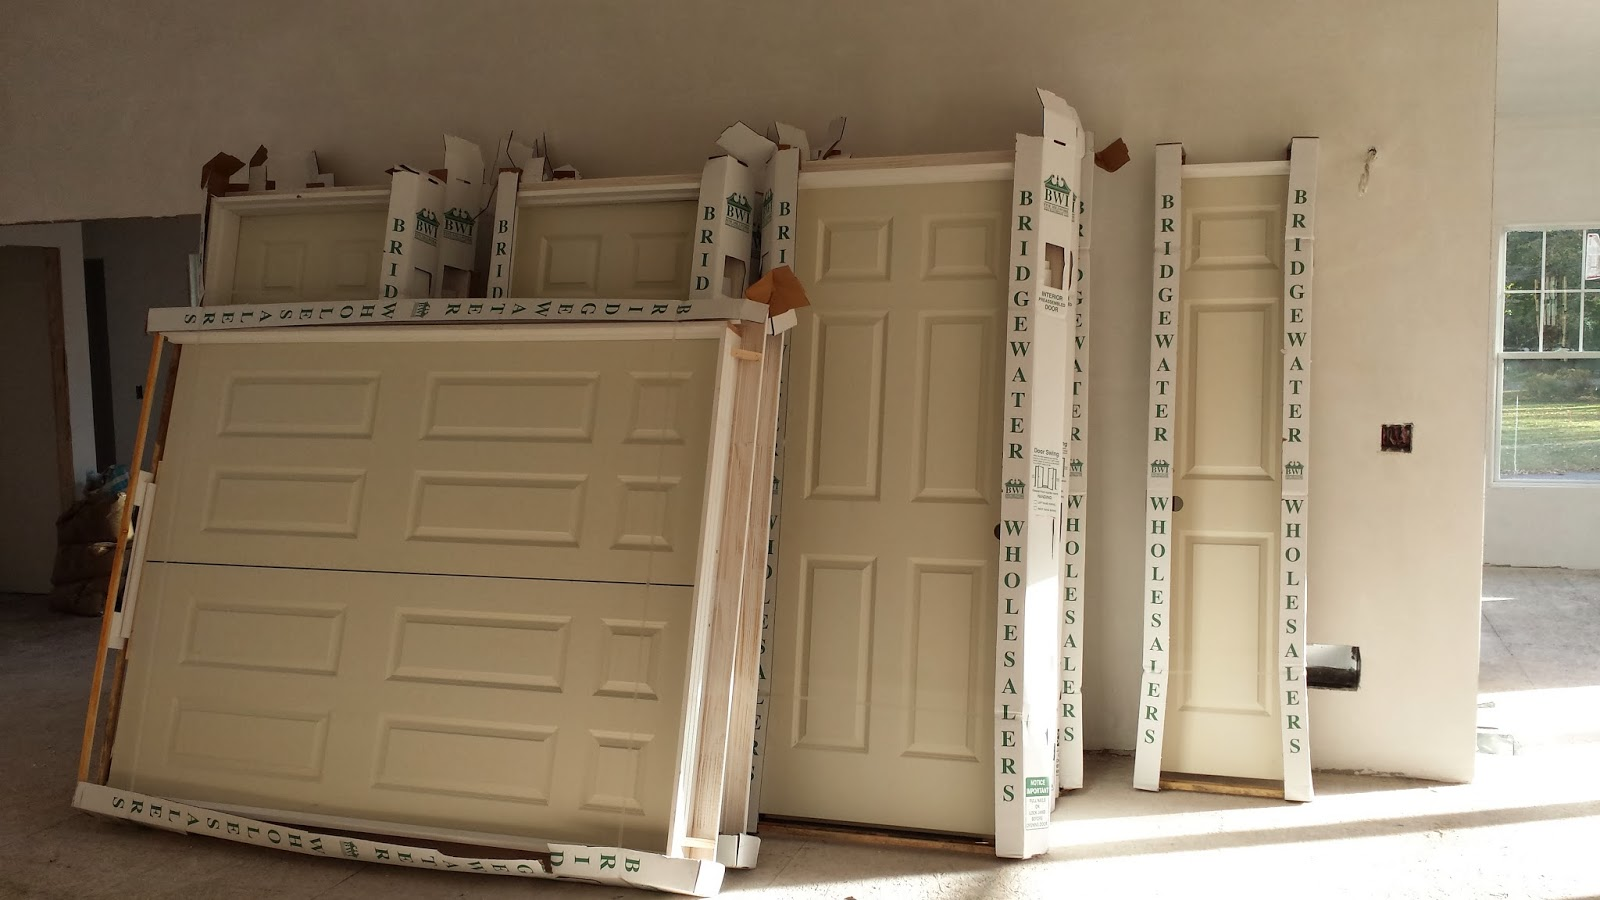 Comhome Interior Trim : The Impatient Home Builder: Starting the Interior Trim